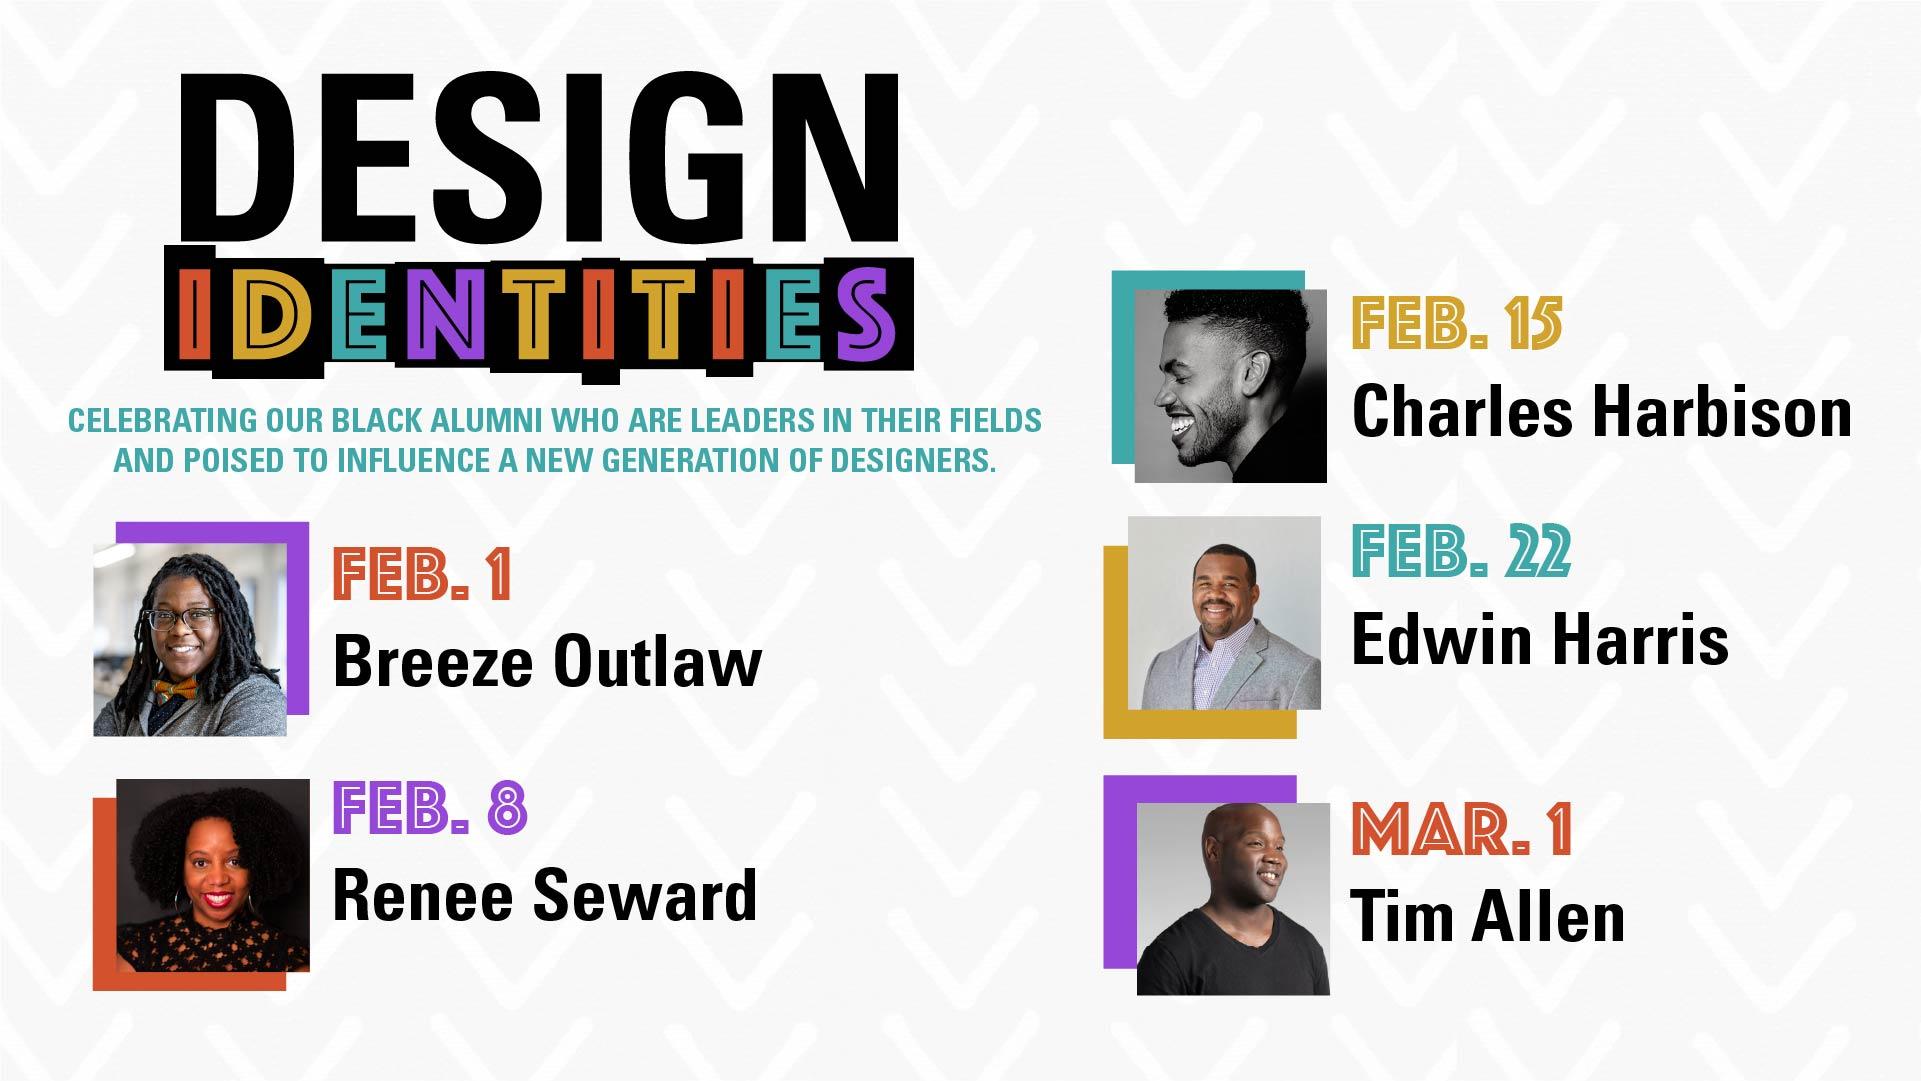 Design Identities Alumni Lineup